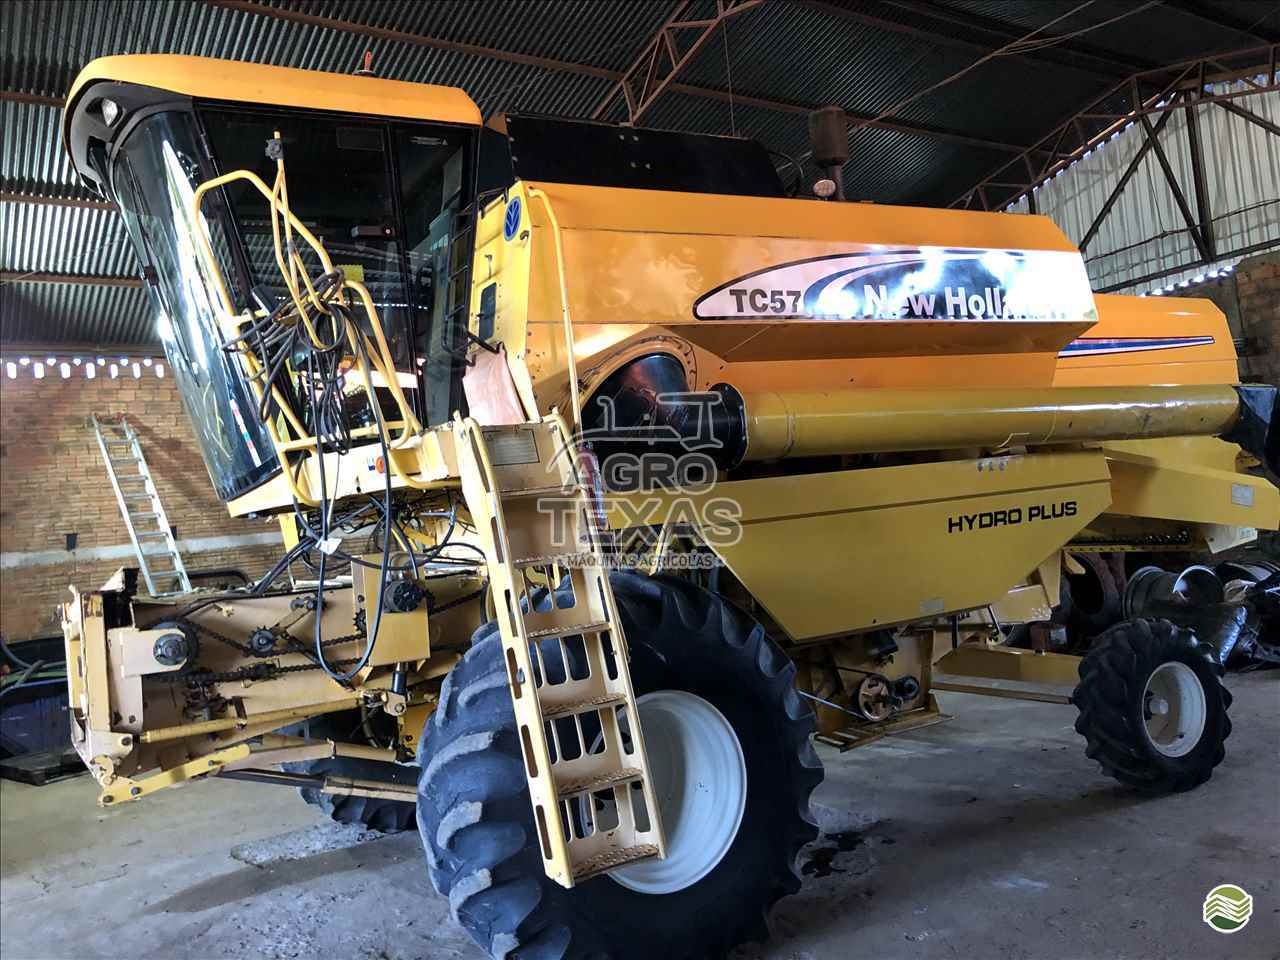 COLHEITADEIRA NEW HOLLAND TC 57 Agro Texas Máquinas Agrícolas VITORINO PARANÁ PR